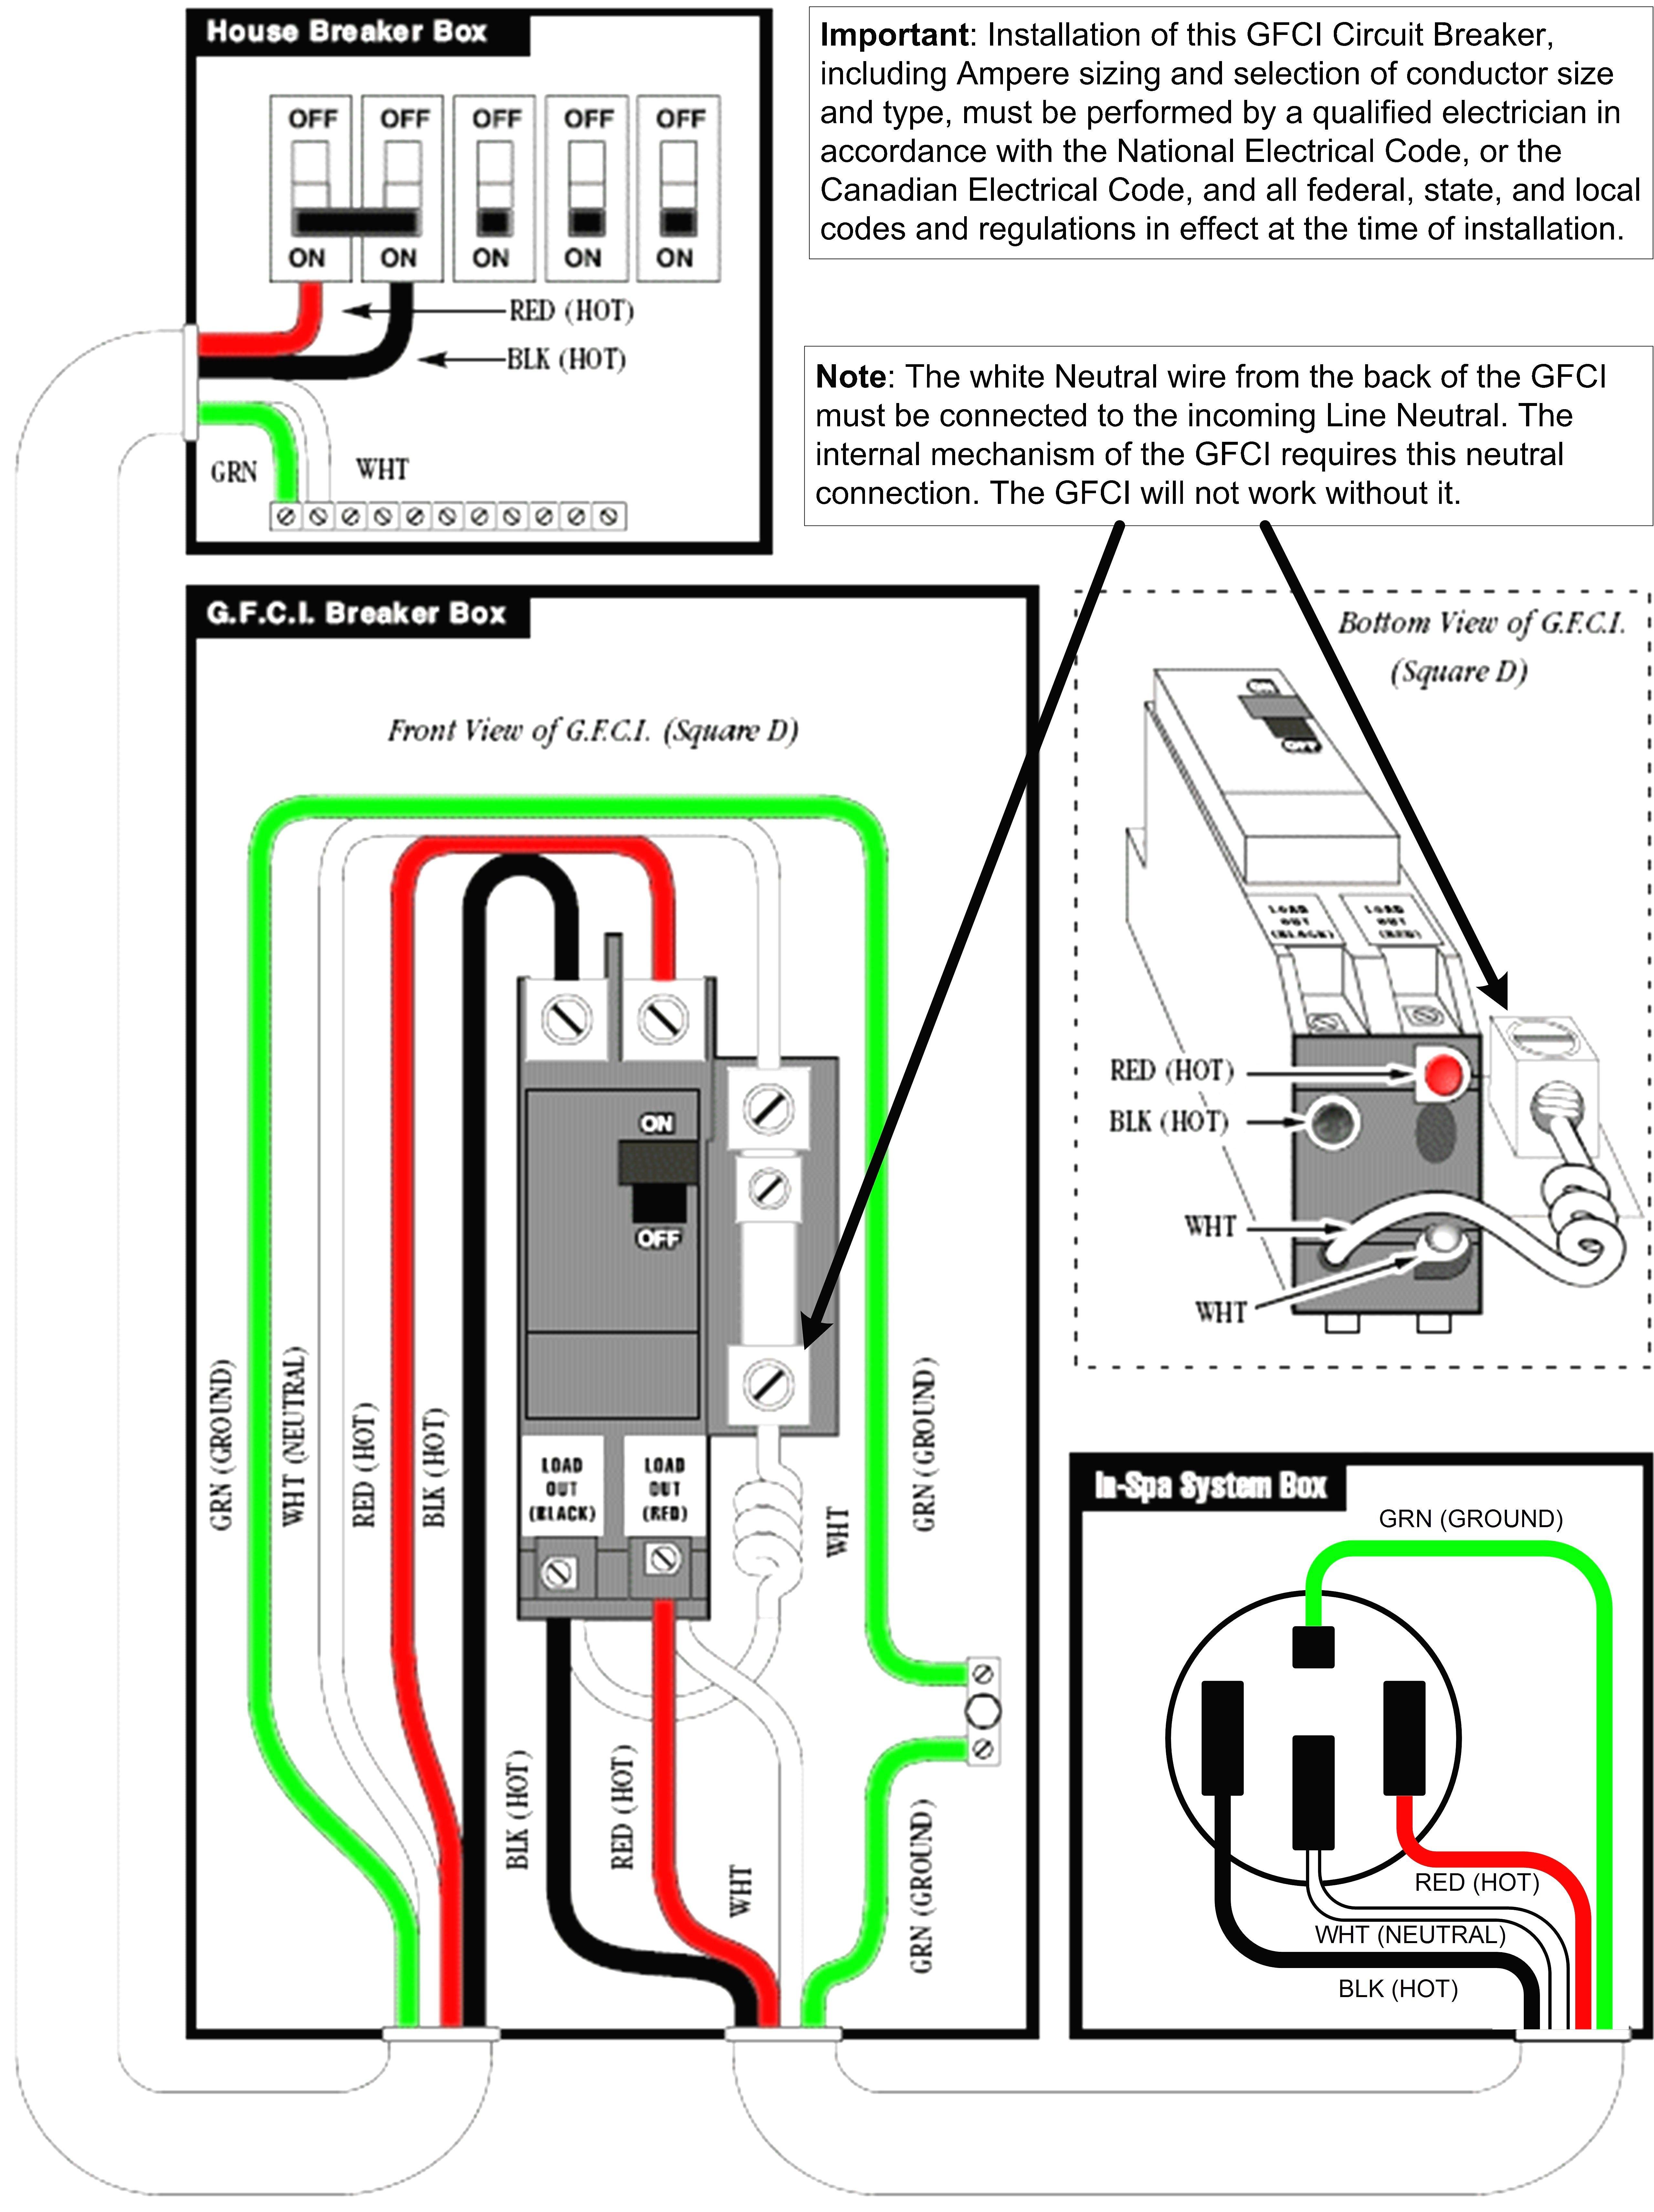 small resolution of new gfci wiring diagram for hot tub diagram diagramsample diagramtemplate wiringdiagram